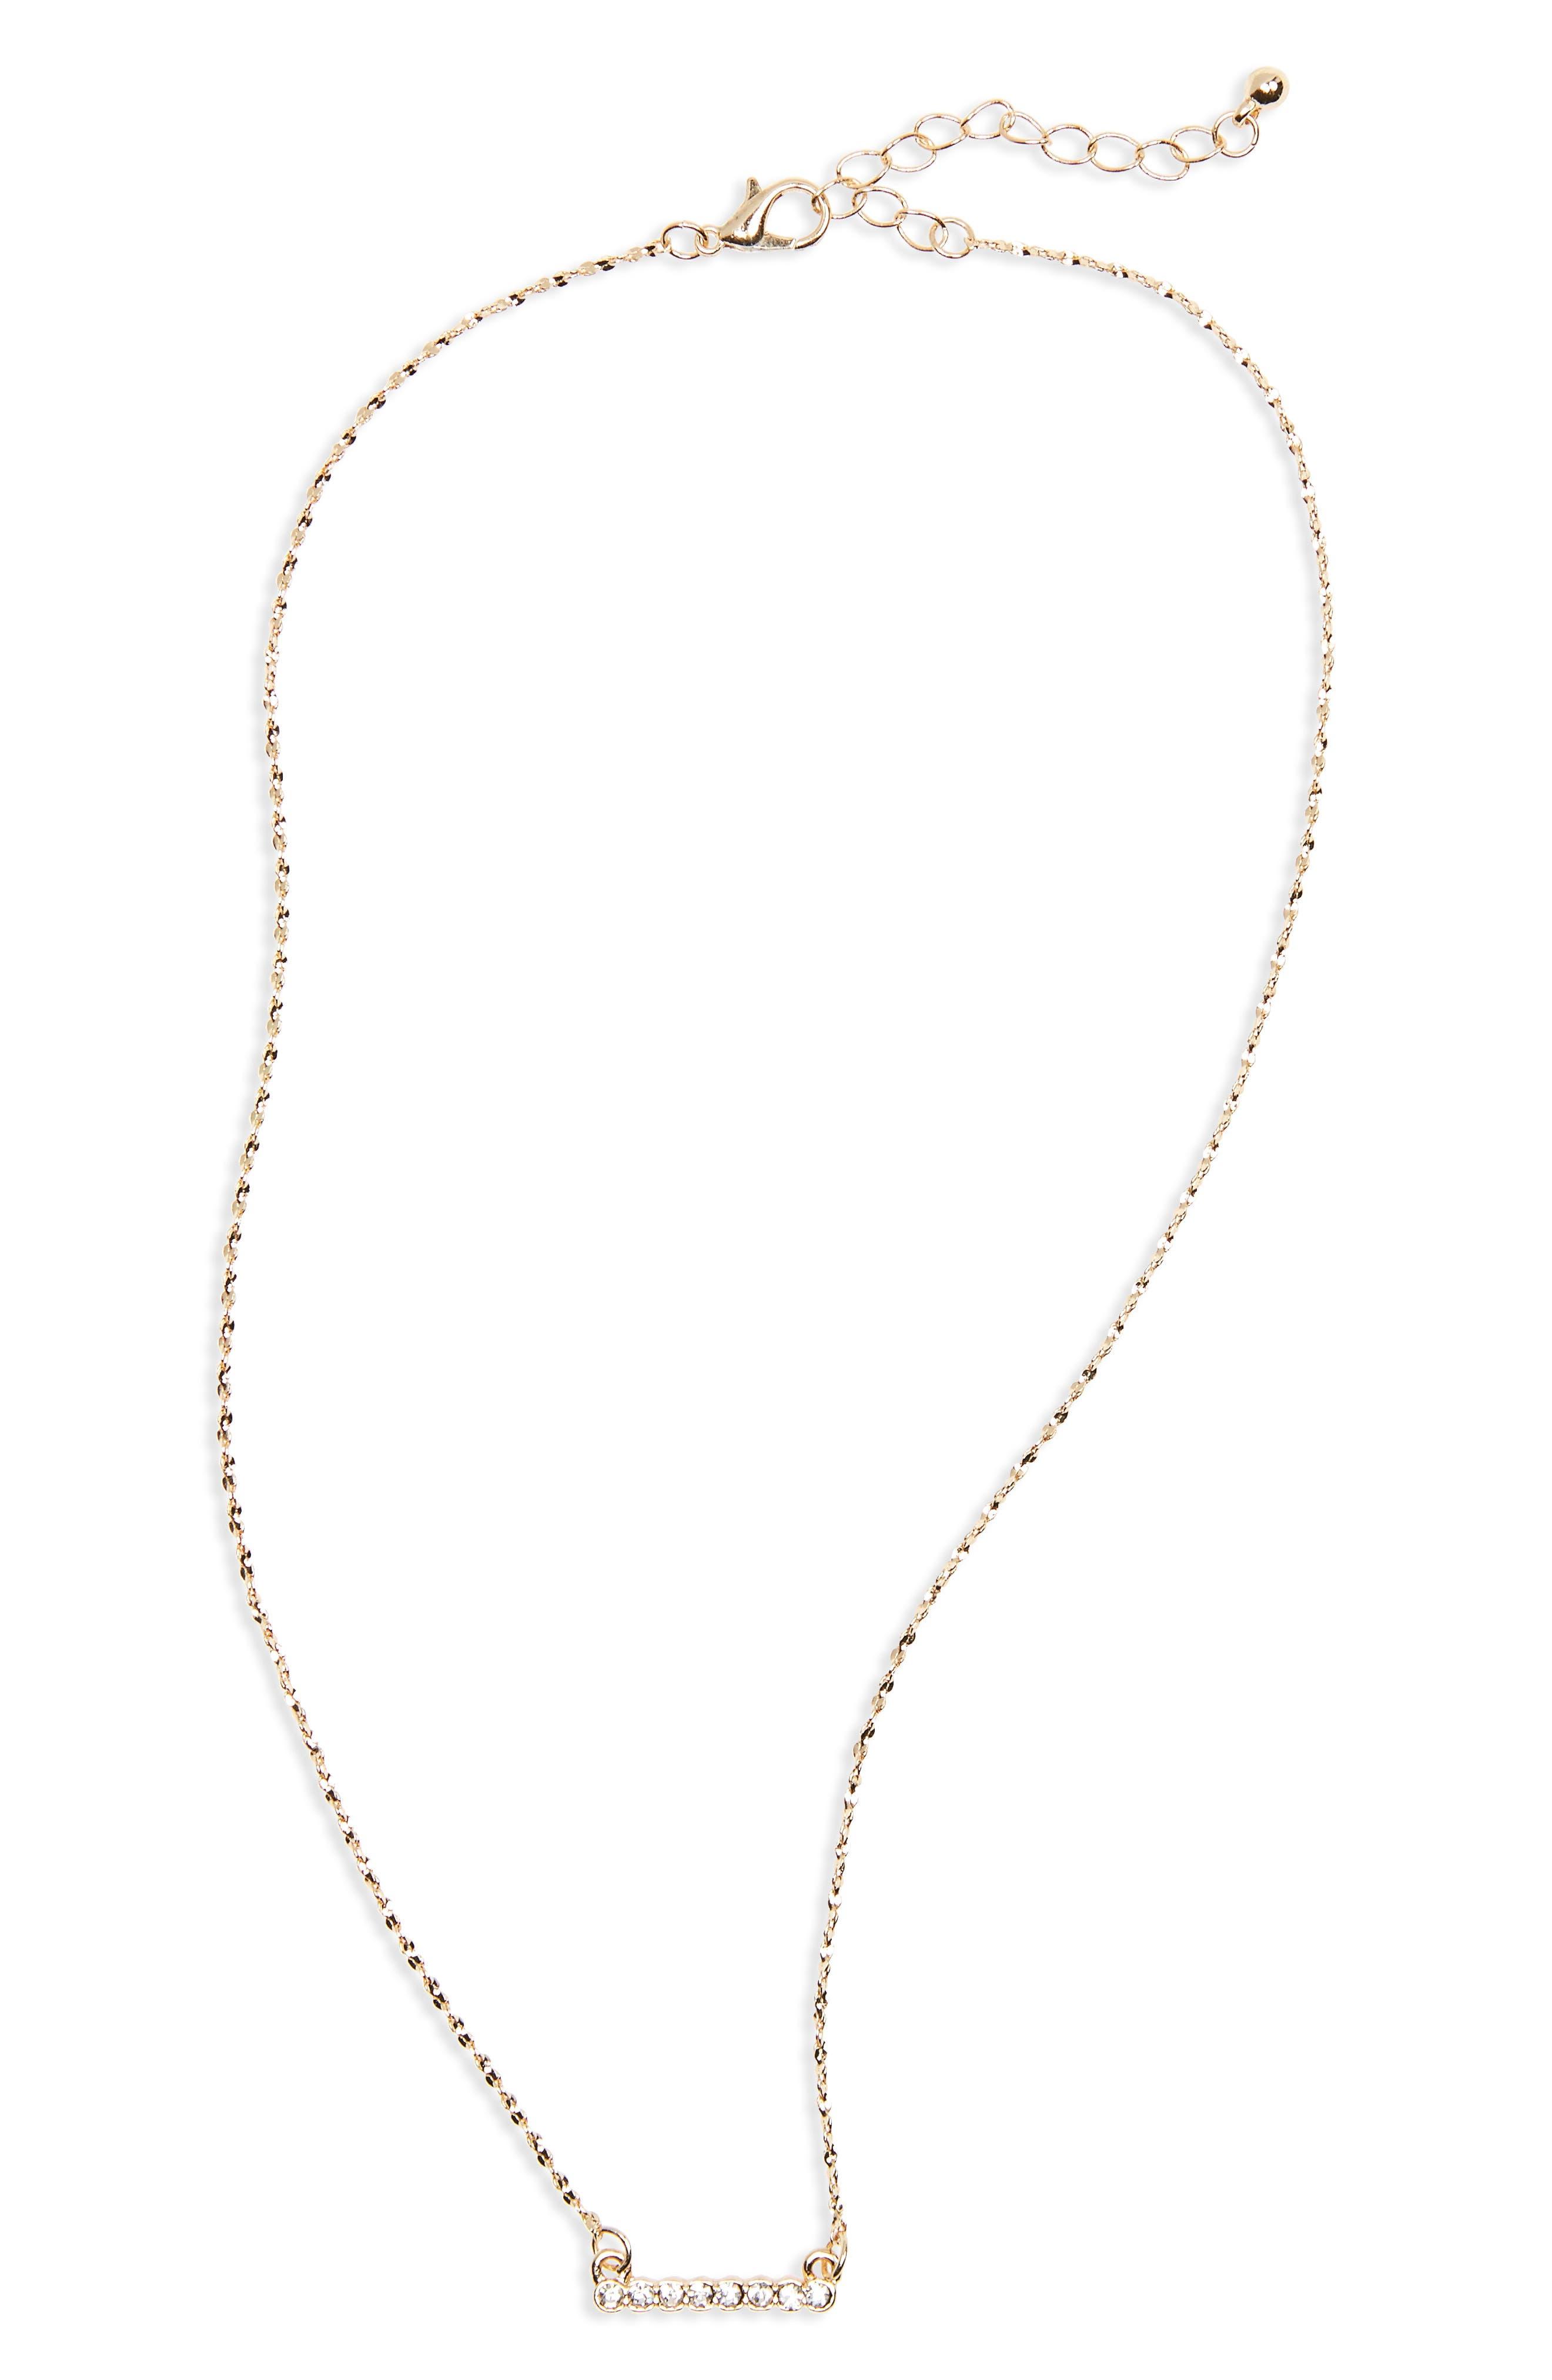 Dainty Crystal Bar Necklace,                         Main,                         color, Gold/ Crystal